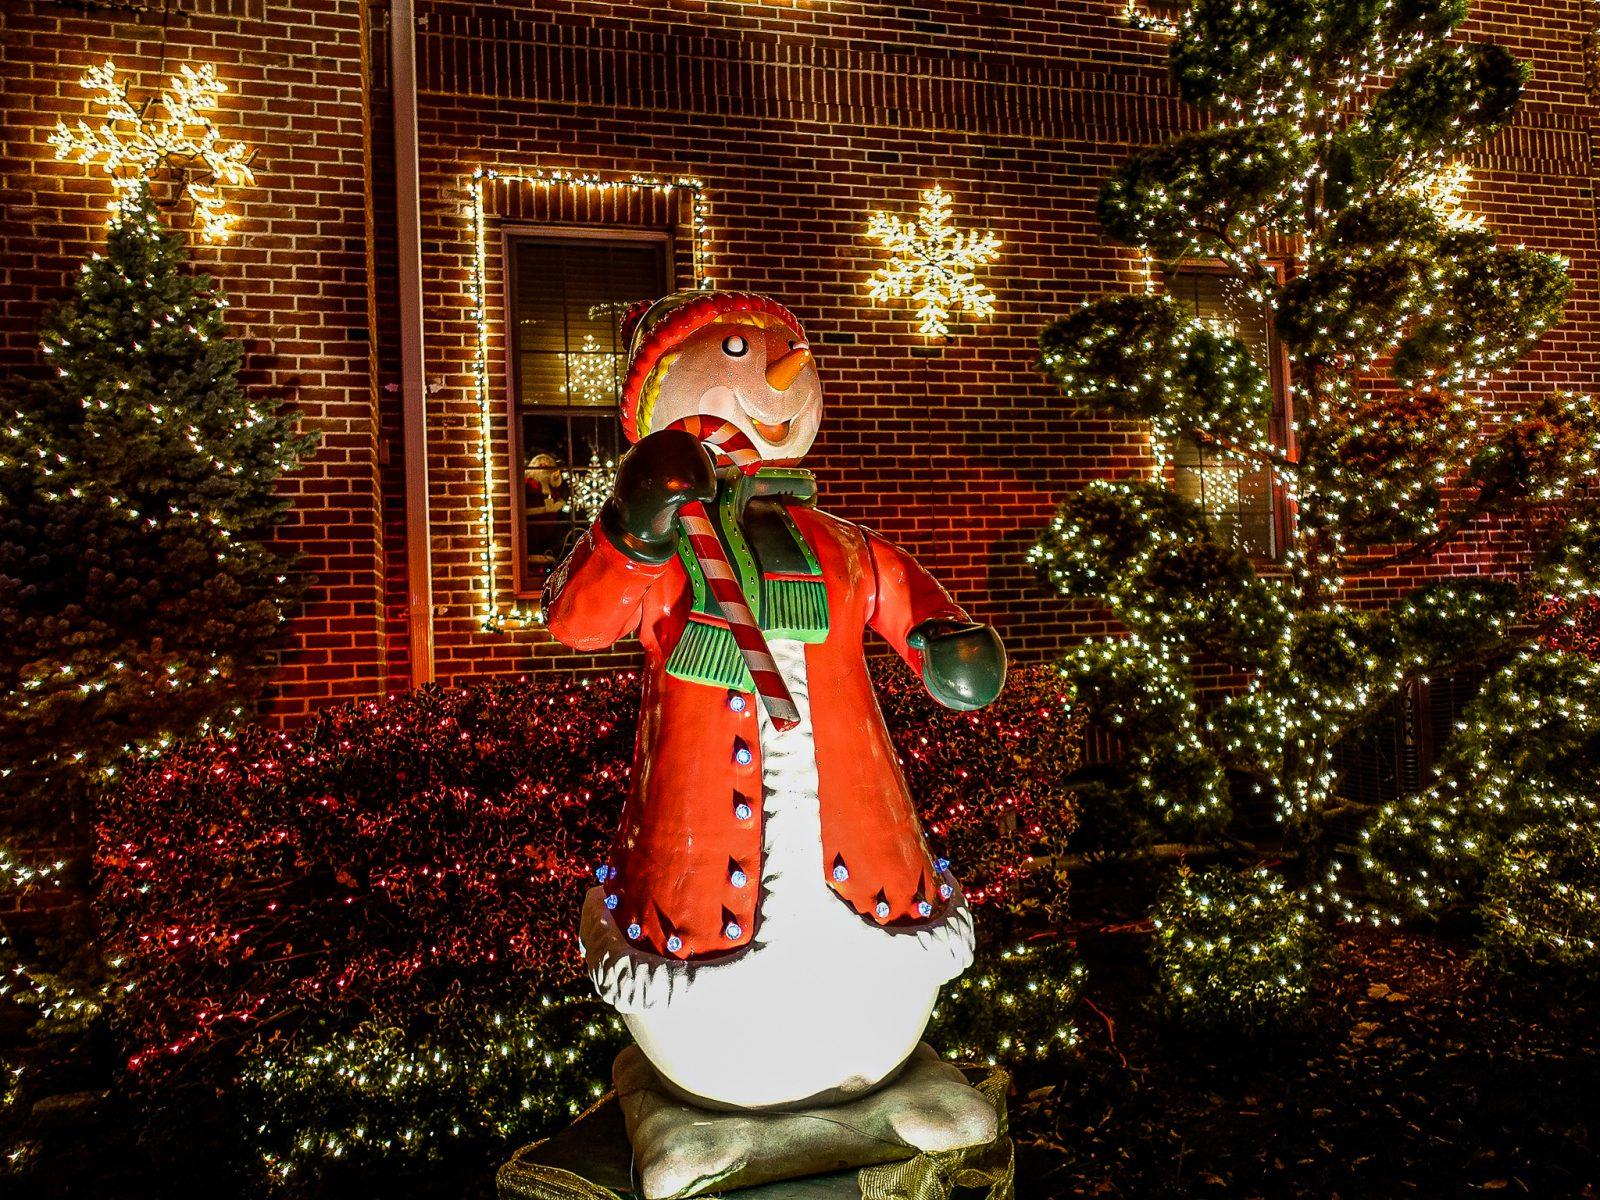 syngende oppblåsbar snømann